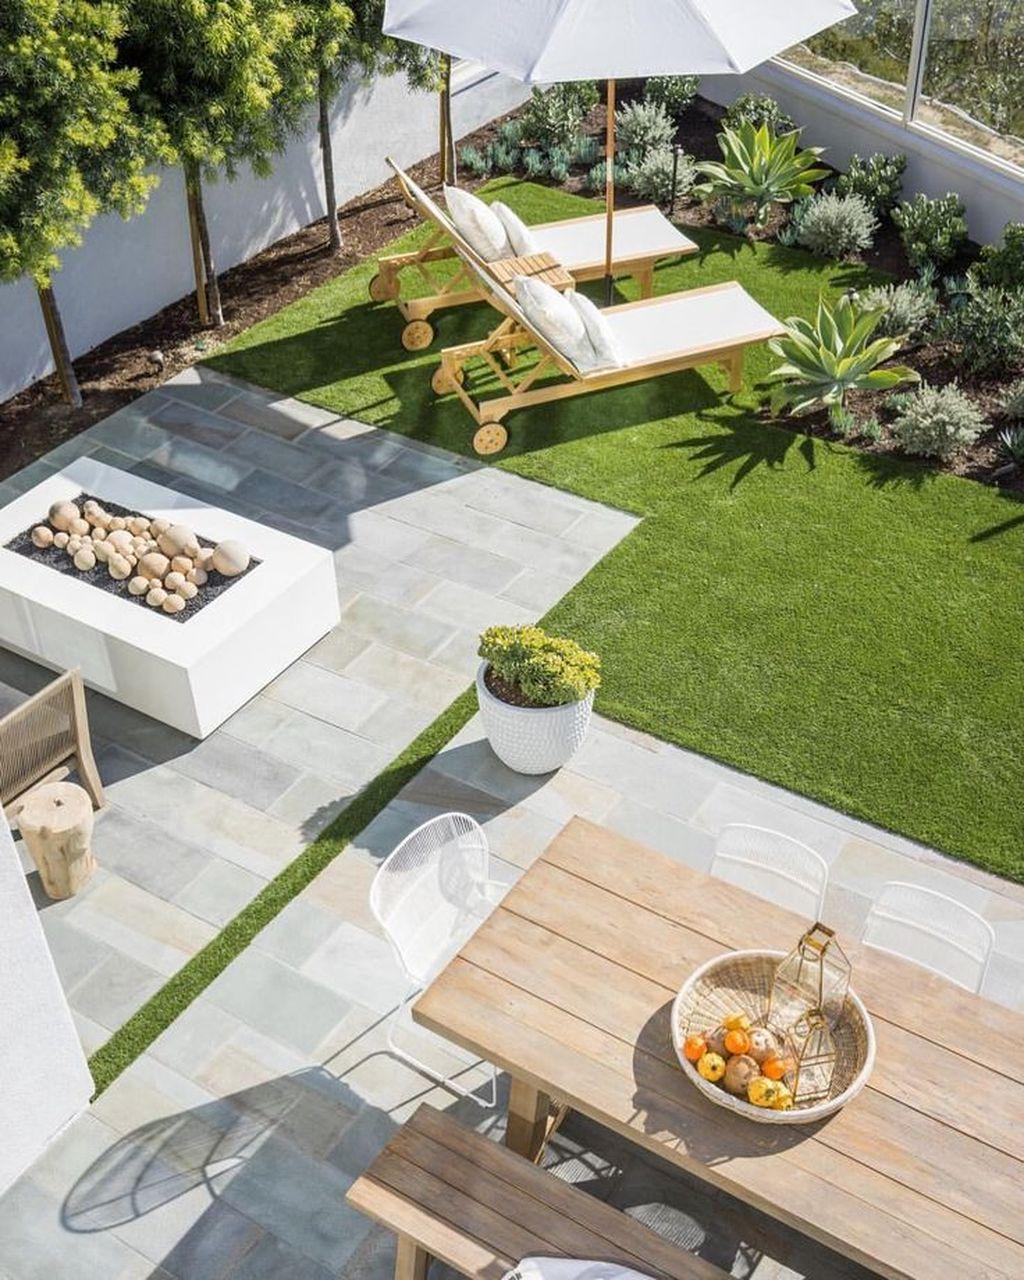 The Best Urban Garden Design Ideas For Your Backyard 12